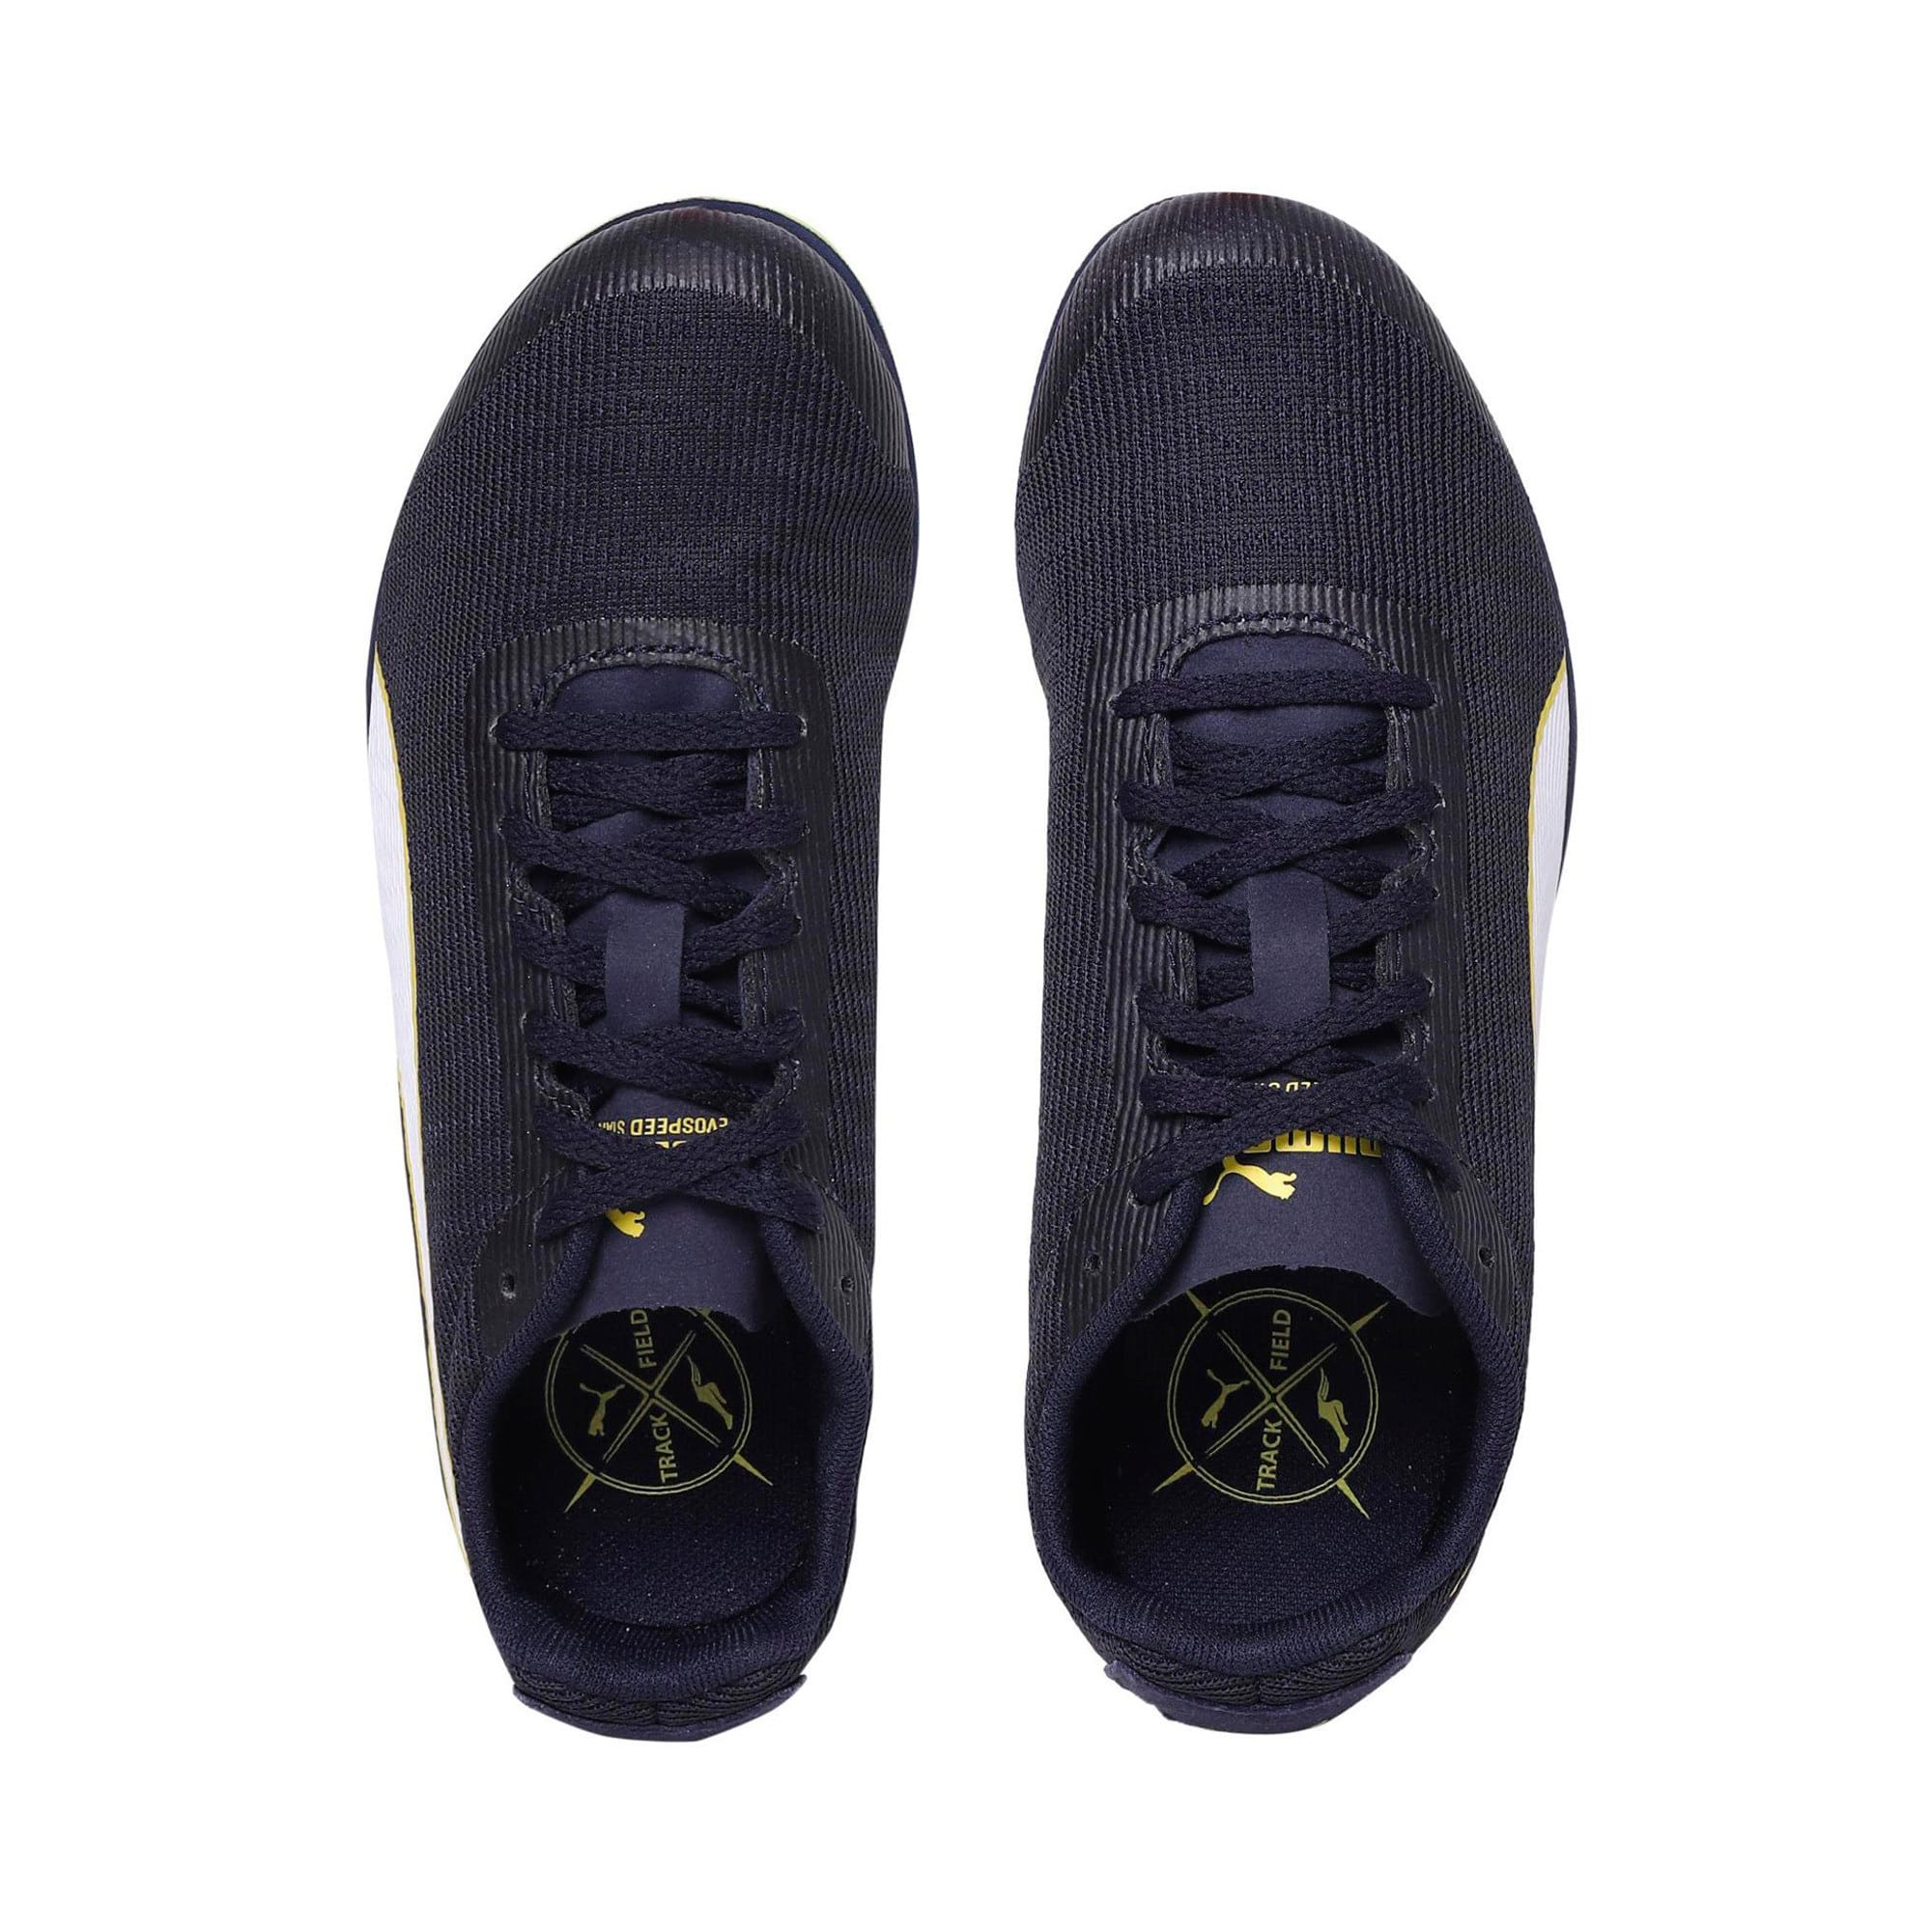 Thumbnail 6 of evoSPEED Star 6 Kids' Running Shoes, Peacoat-Puma Black-Yellow, medium-IND